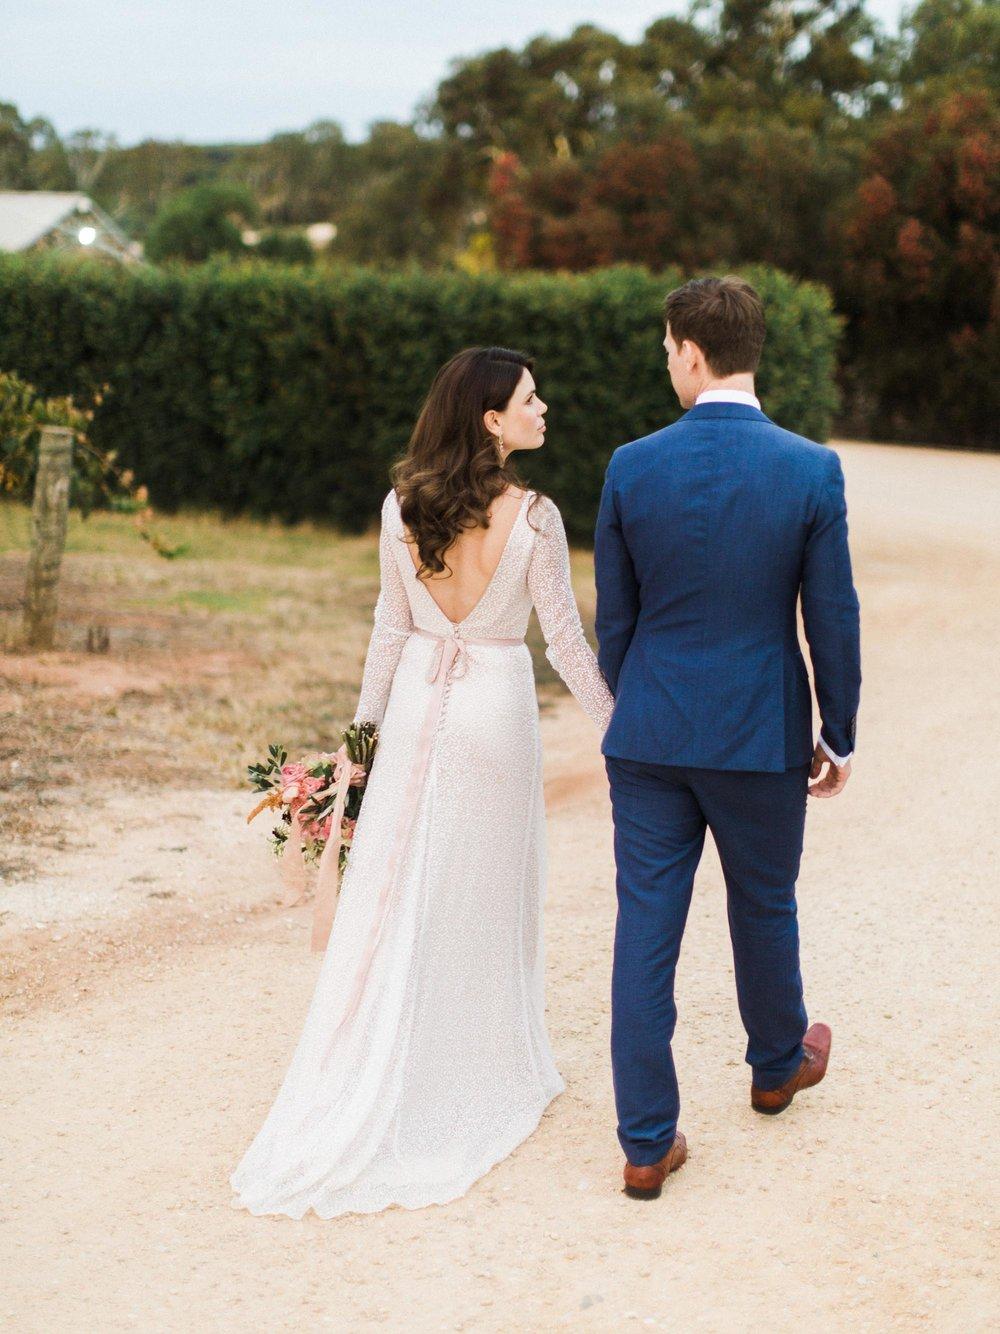 Hentley-Farm-wedding-photography-059.jpg